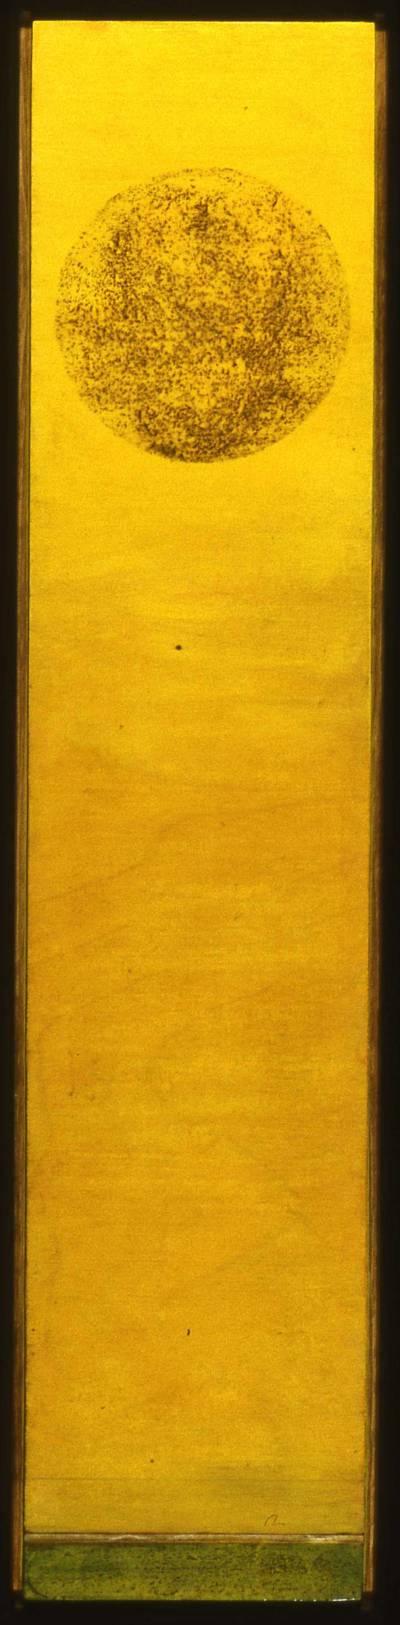 wood - Yellow Skylg.jpg